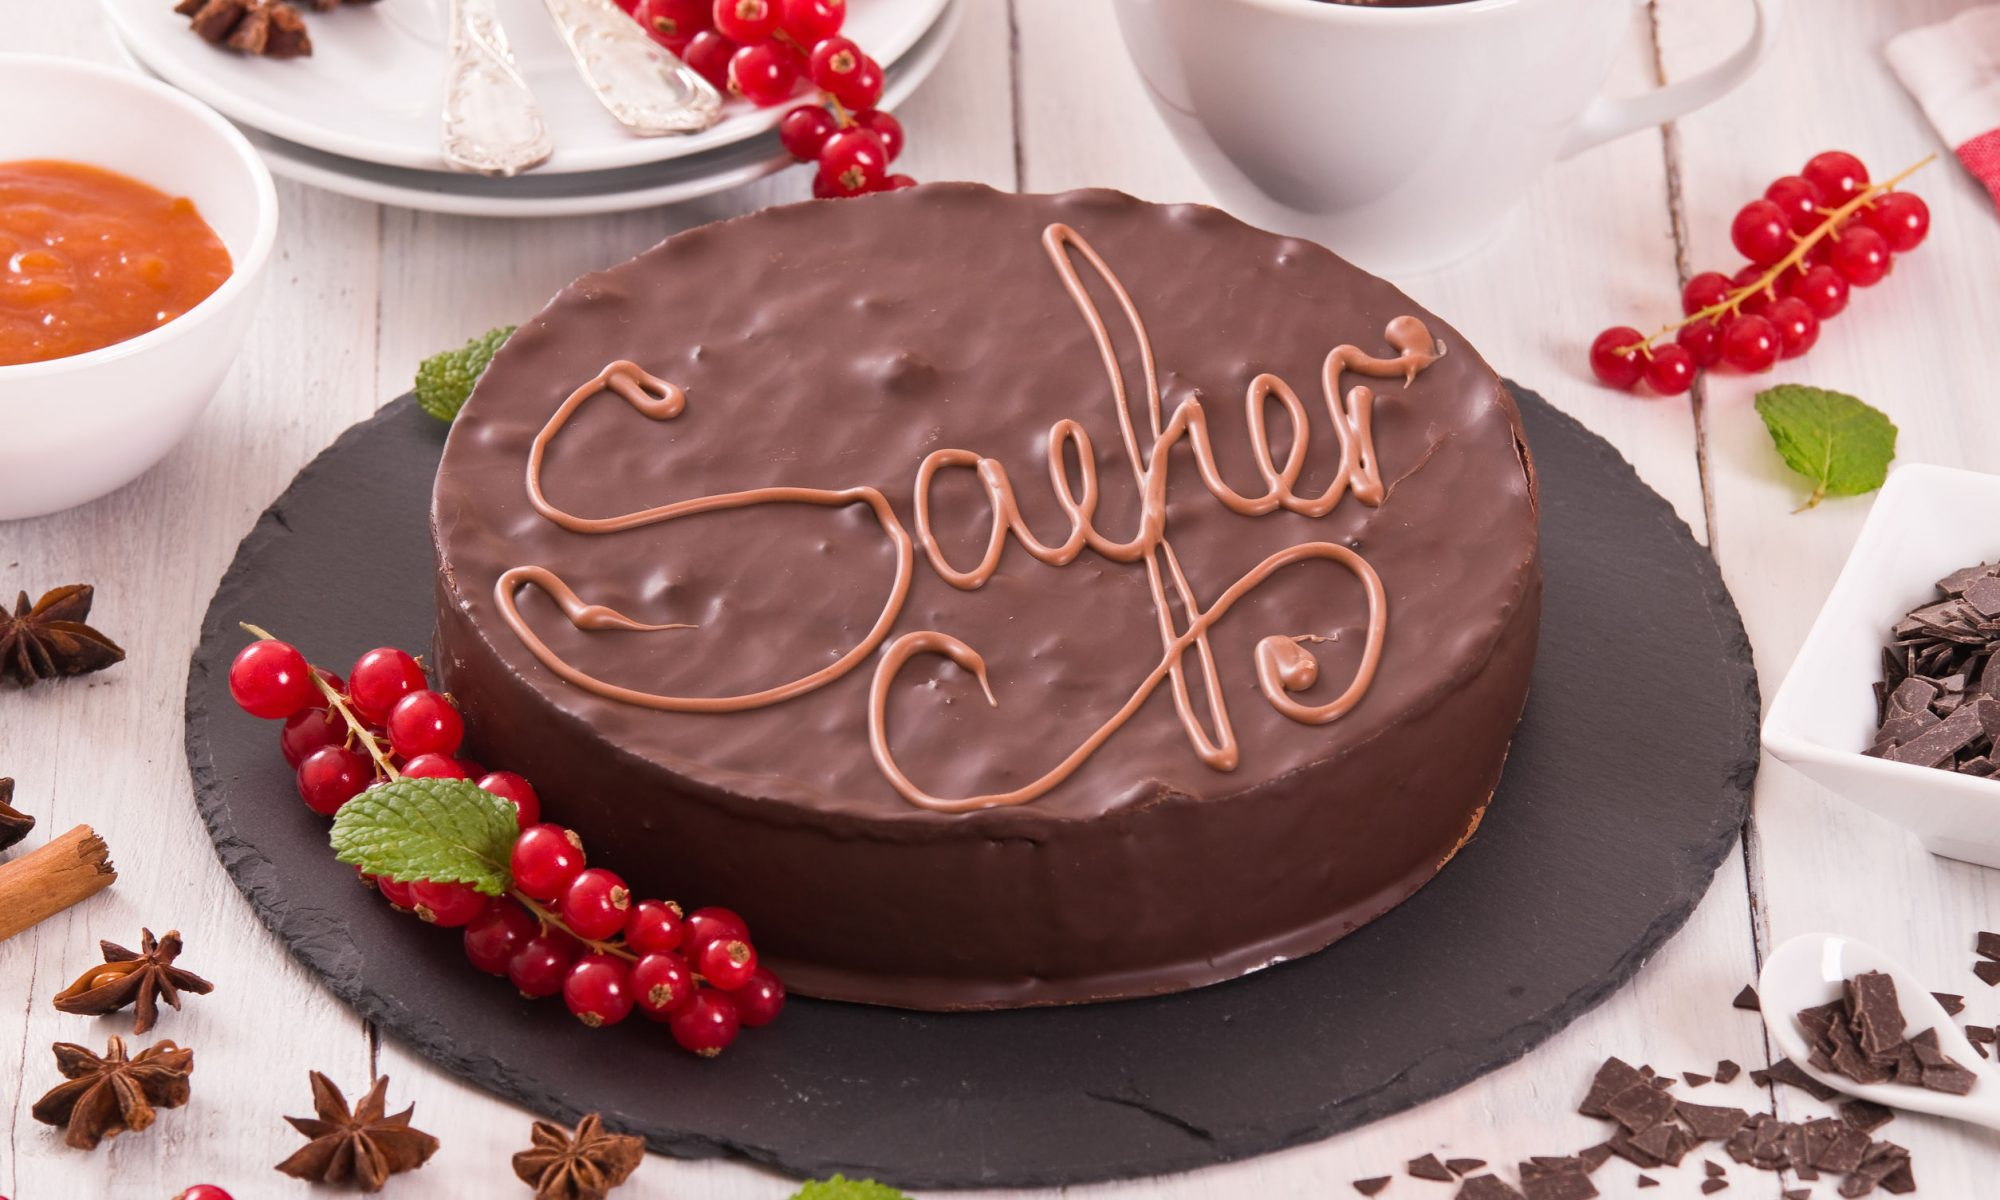 Торт «Захер» рецепт